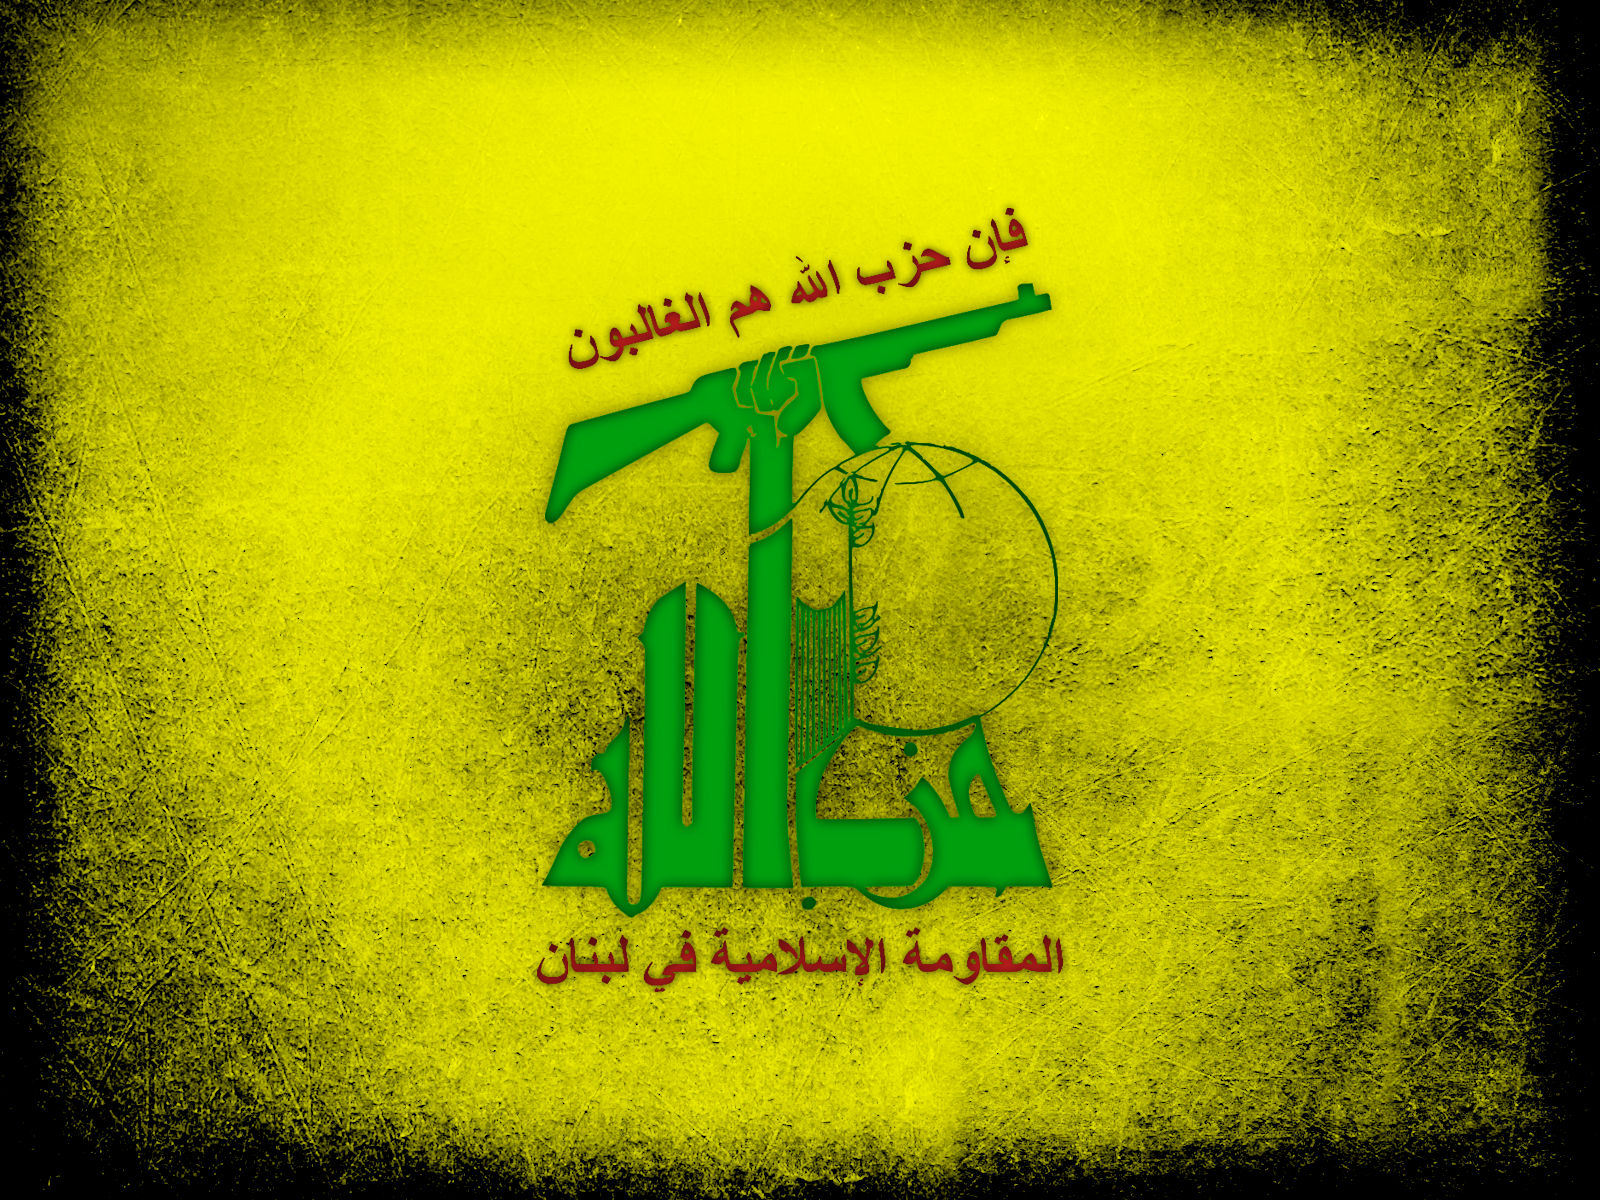 palestinian hamas rebel flag wallpaper 1600x1200 | download